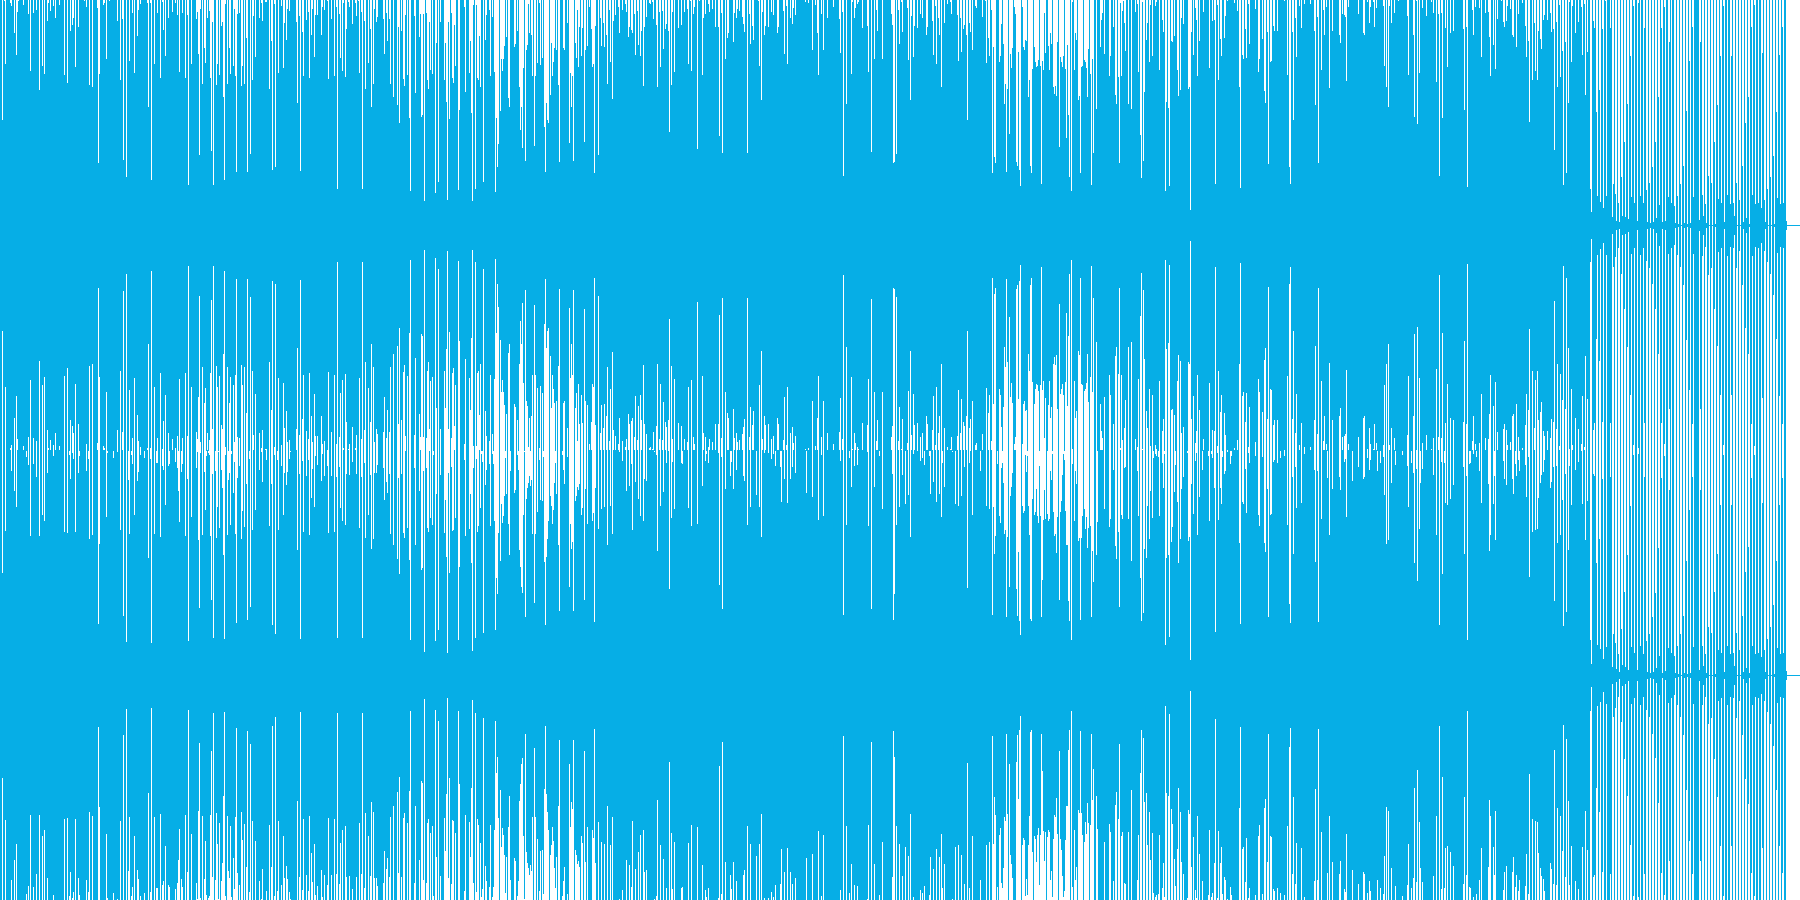 minimal house 37  の再生済みの波形